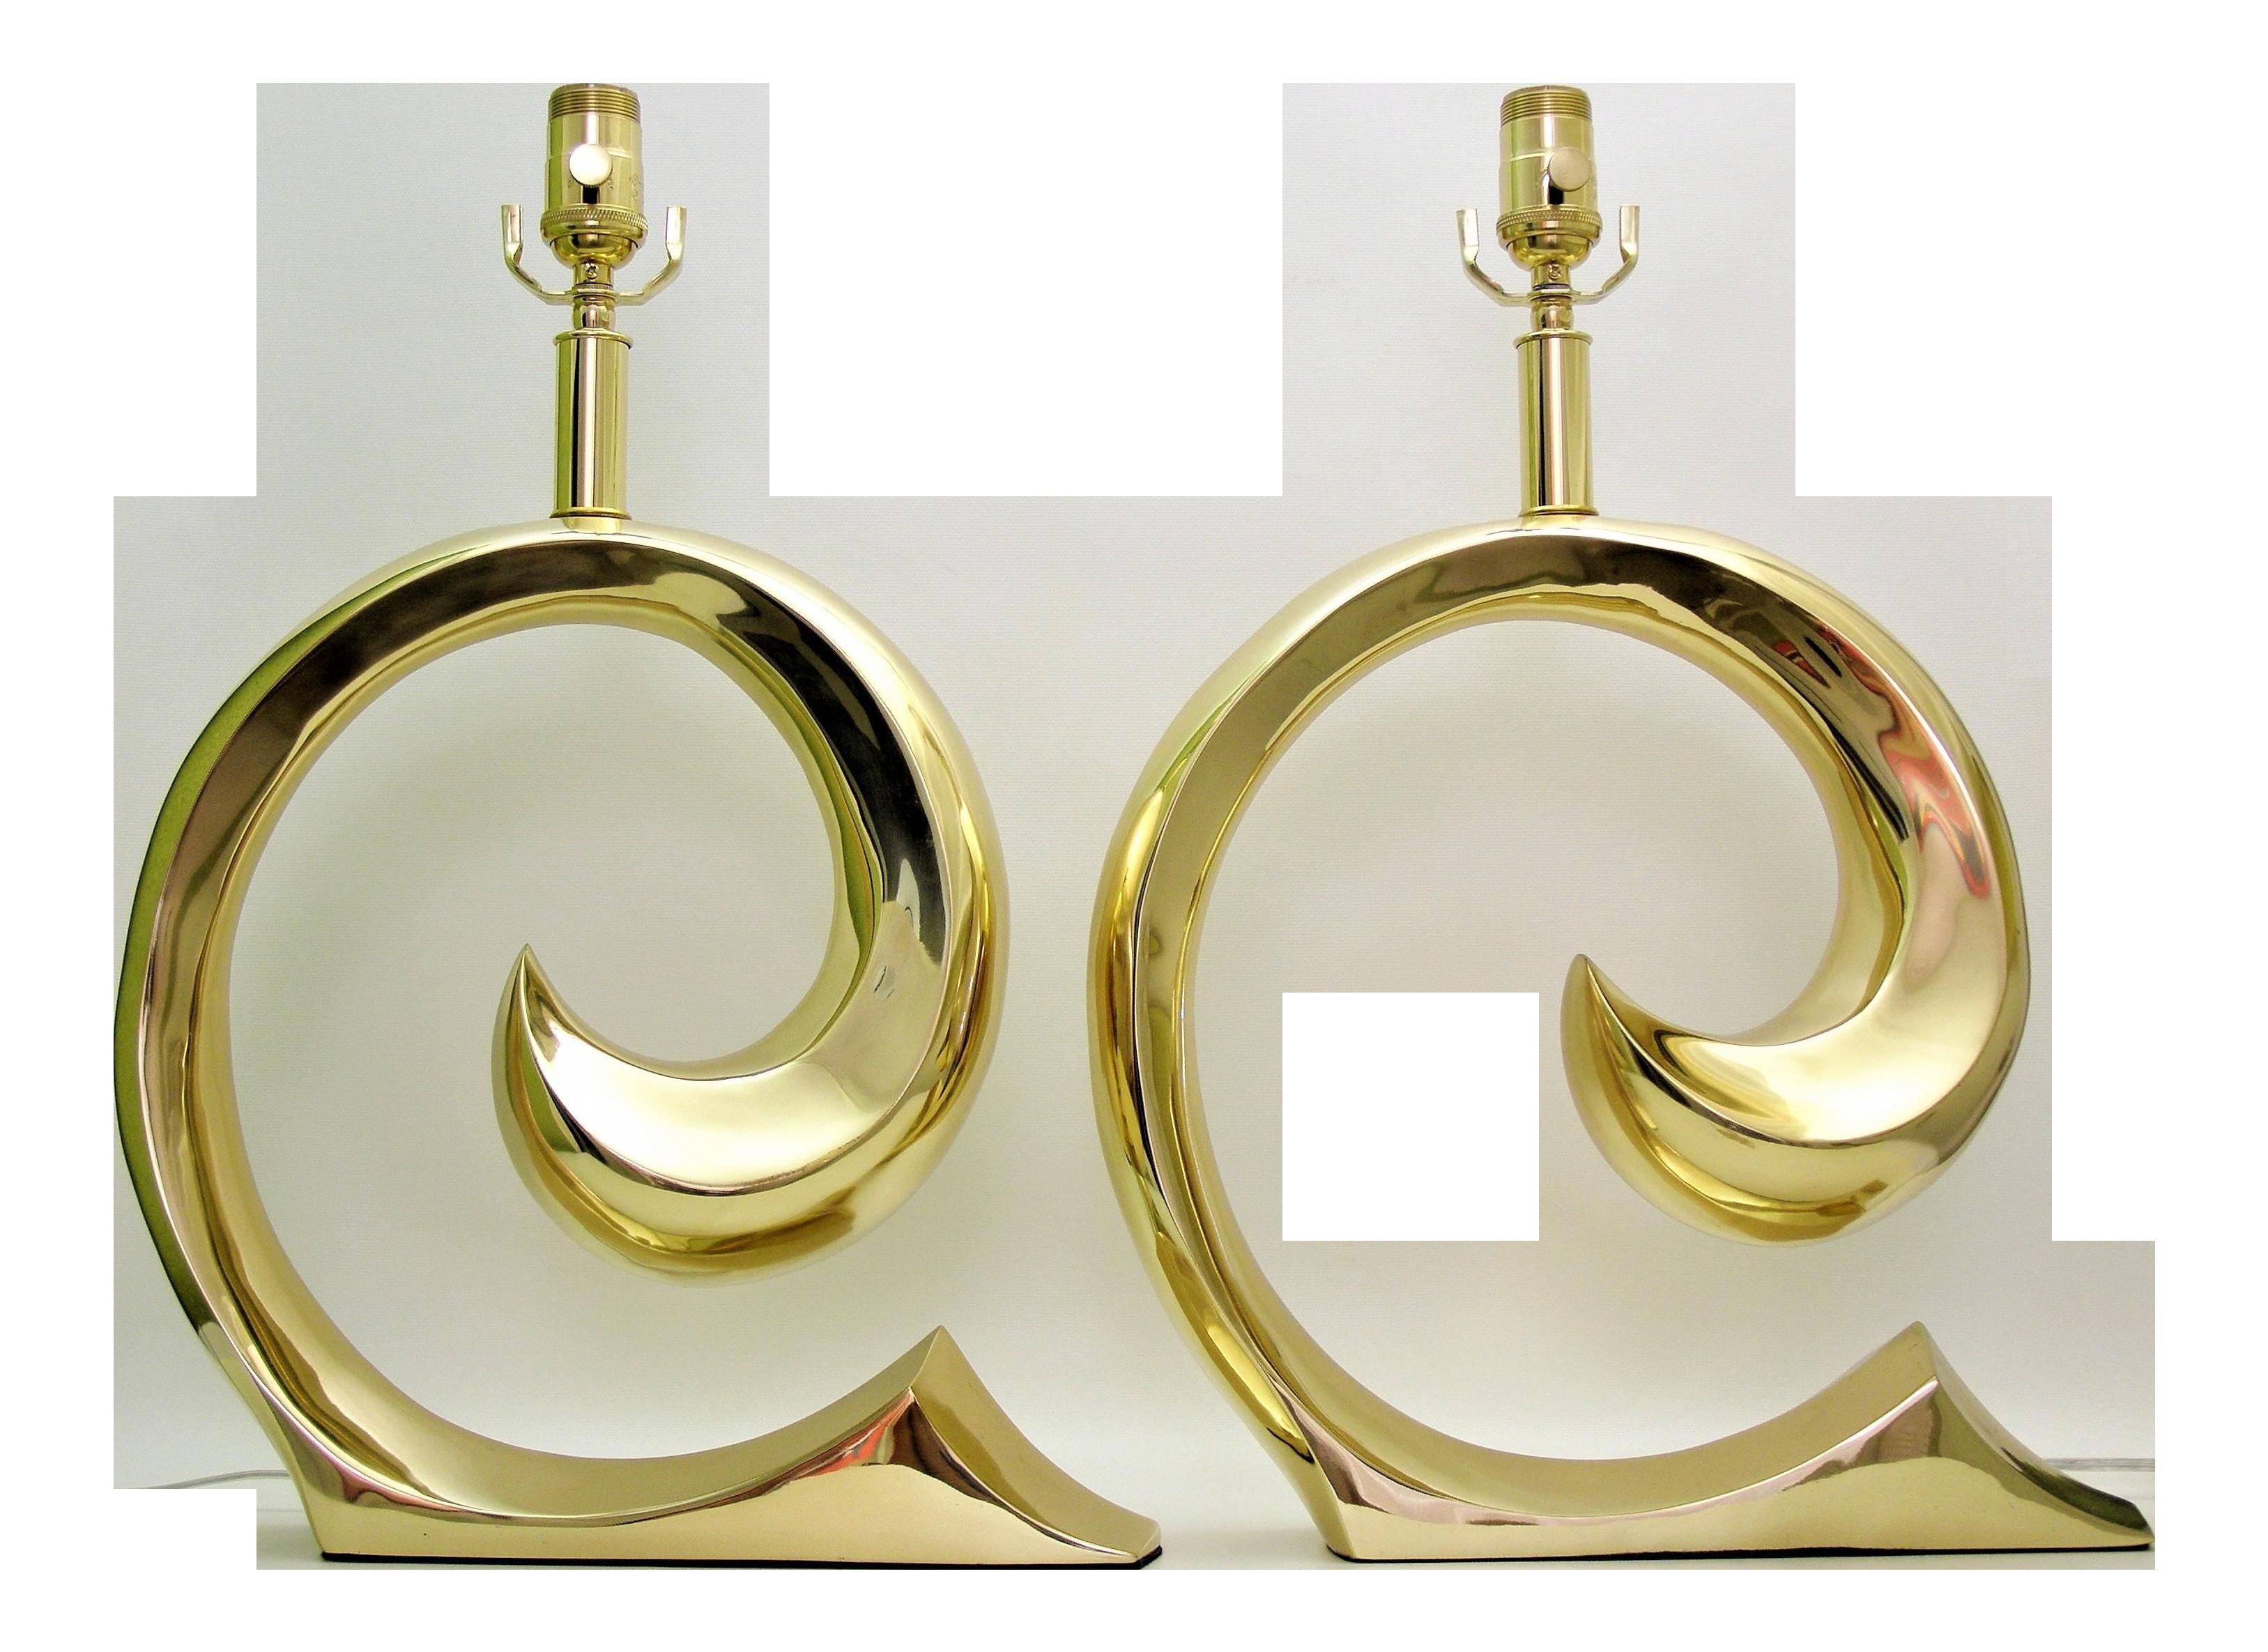 Restored pierre cardin mid century modern solid brass logo restored pierre cardin mid century modern solid brass logo designer lamps a pair millennial chairish biocorpaavc Choice Image